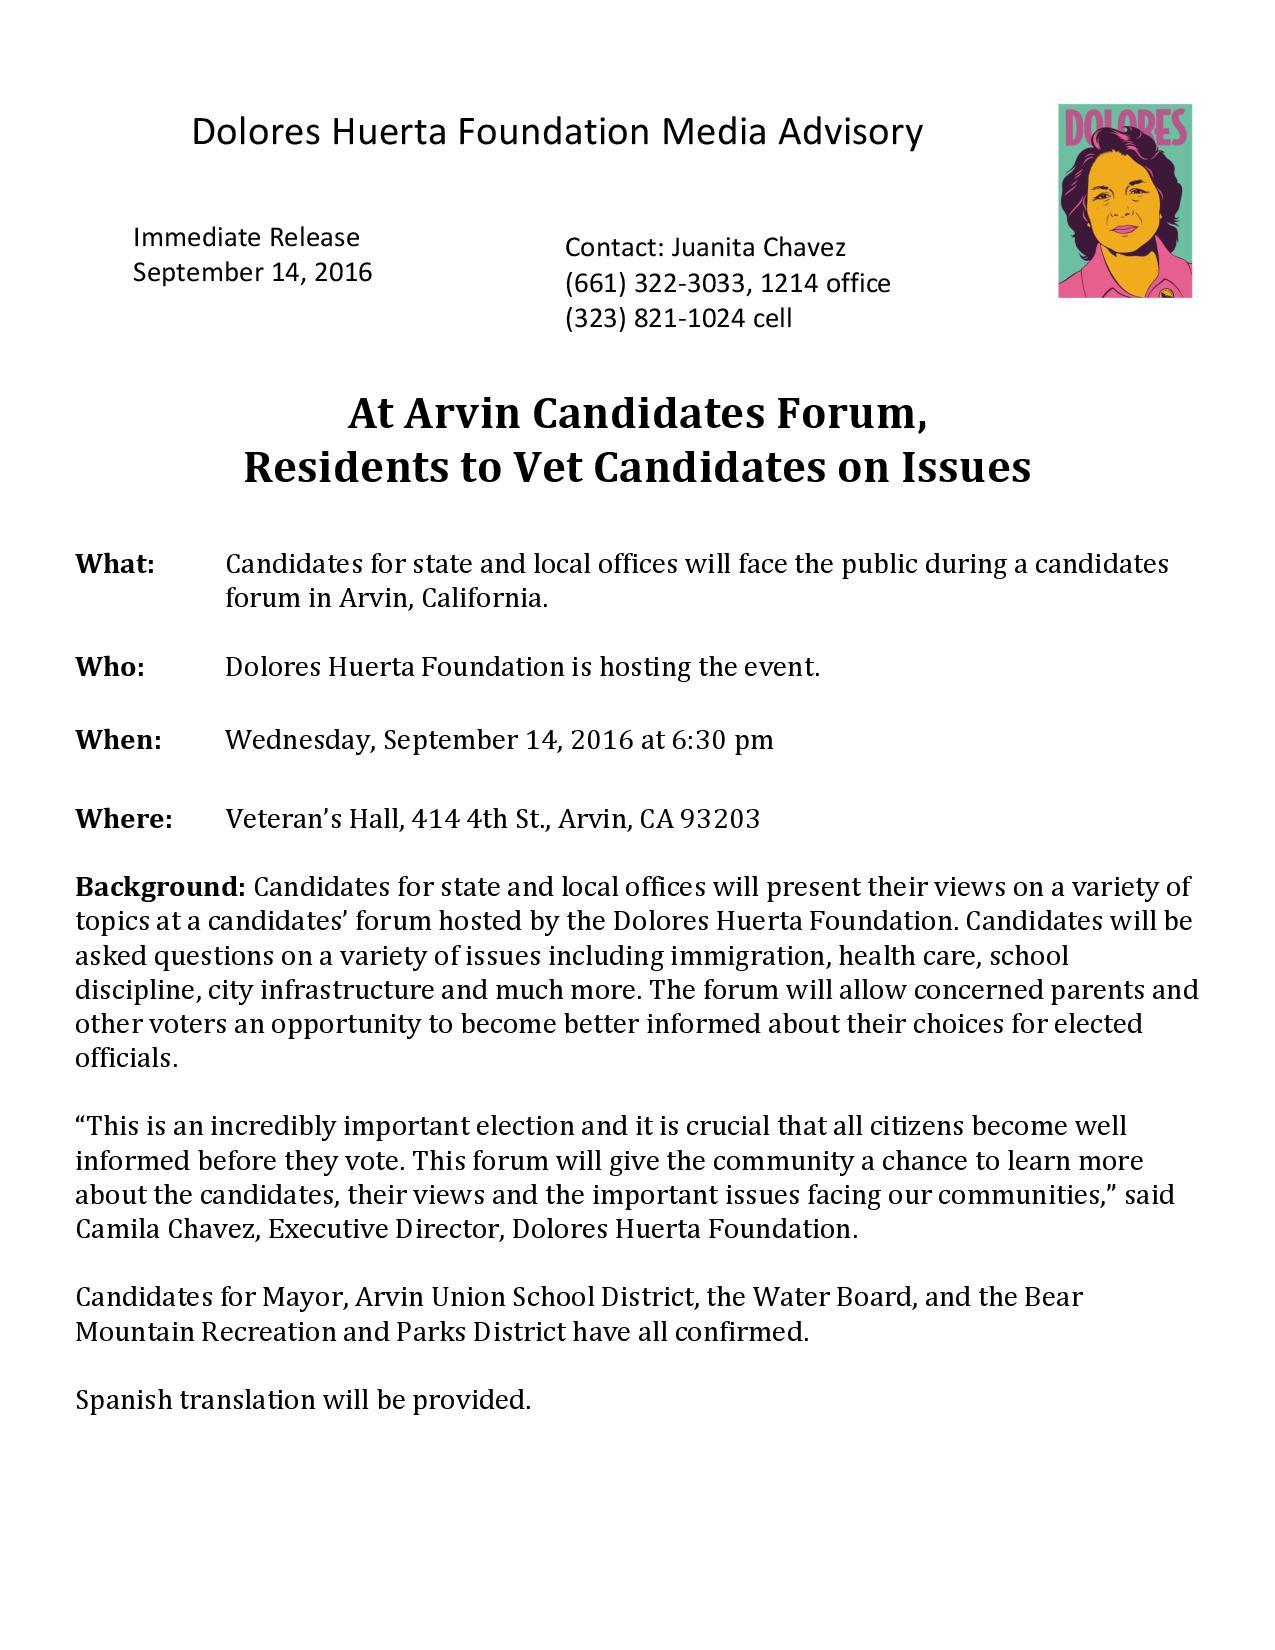 Media Advisory: Arvin Candidates Forum 9-14-16